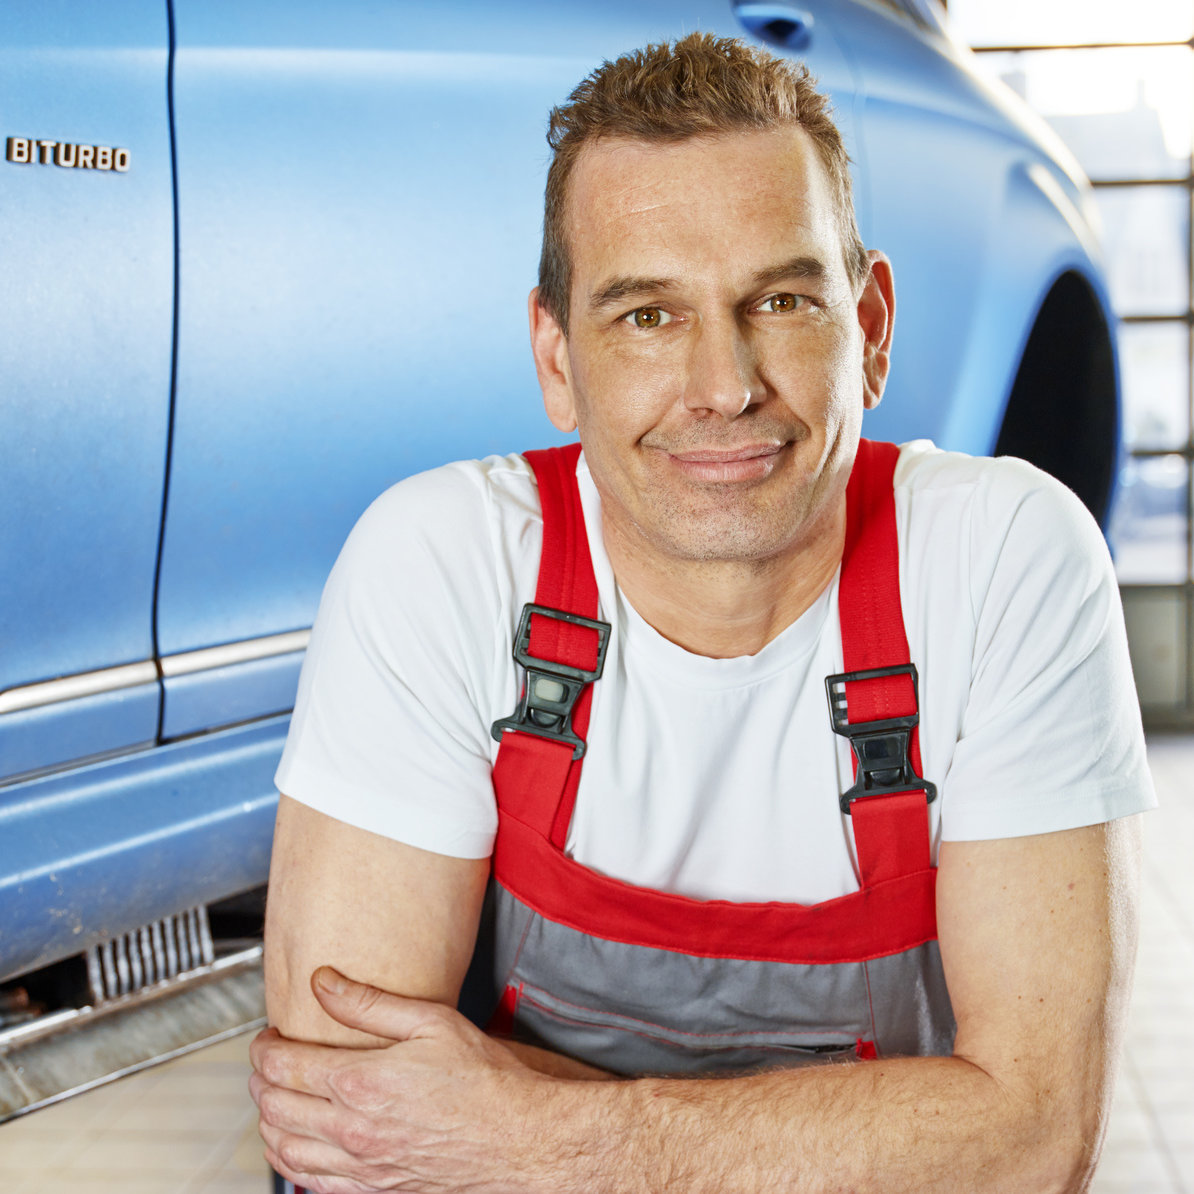 Master mechanic in a garage